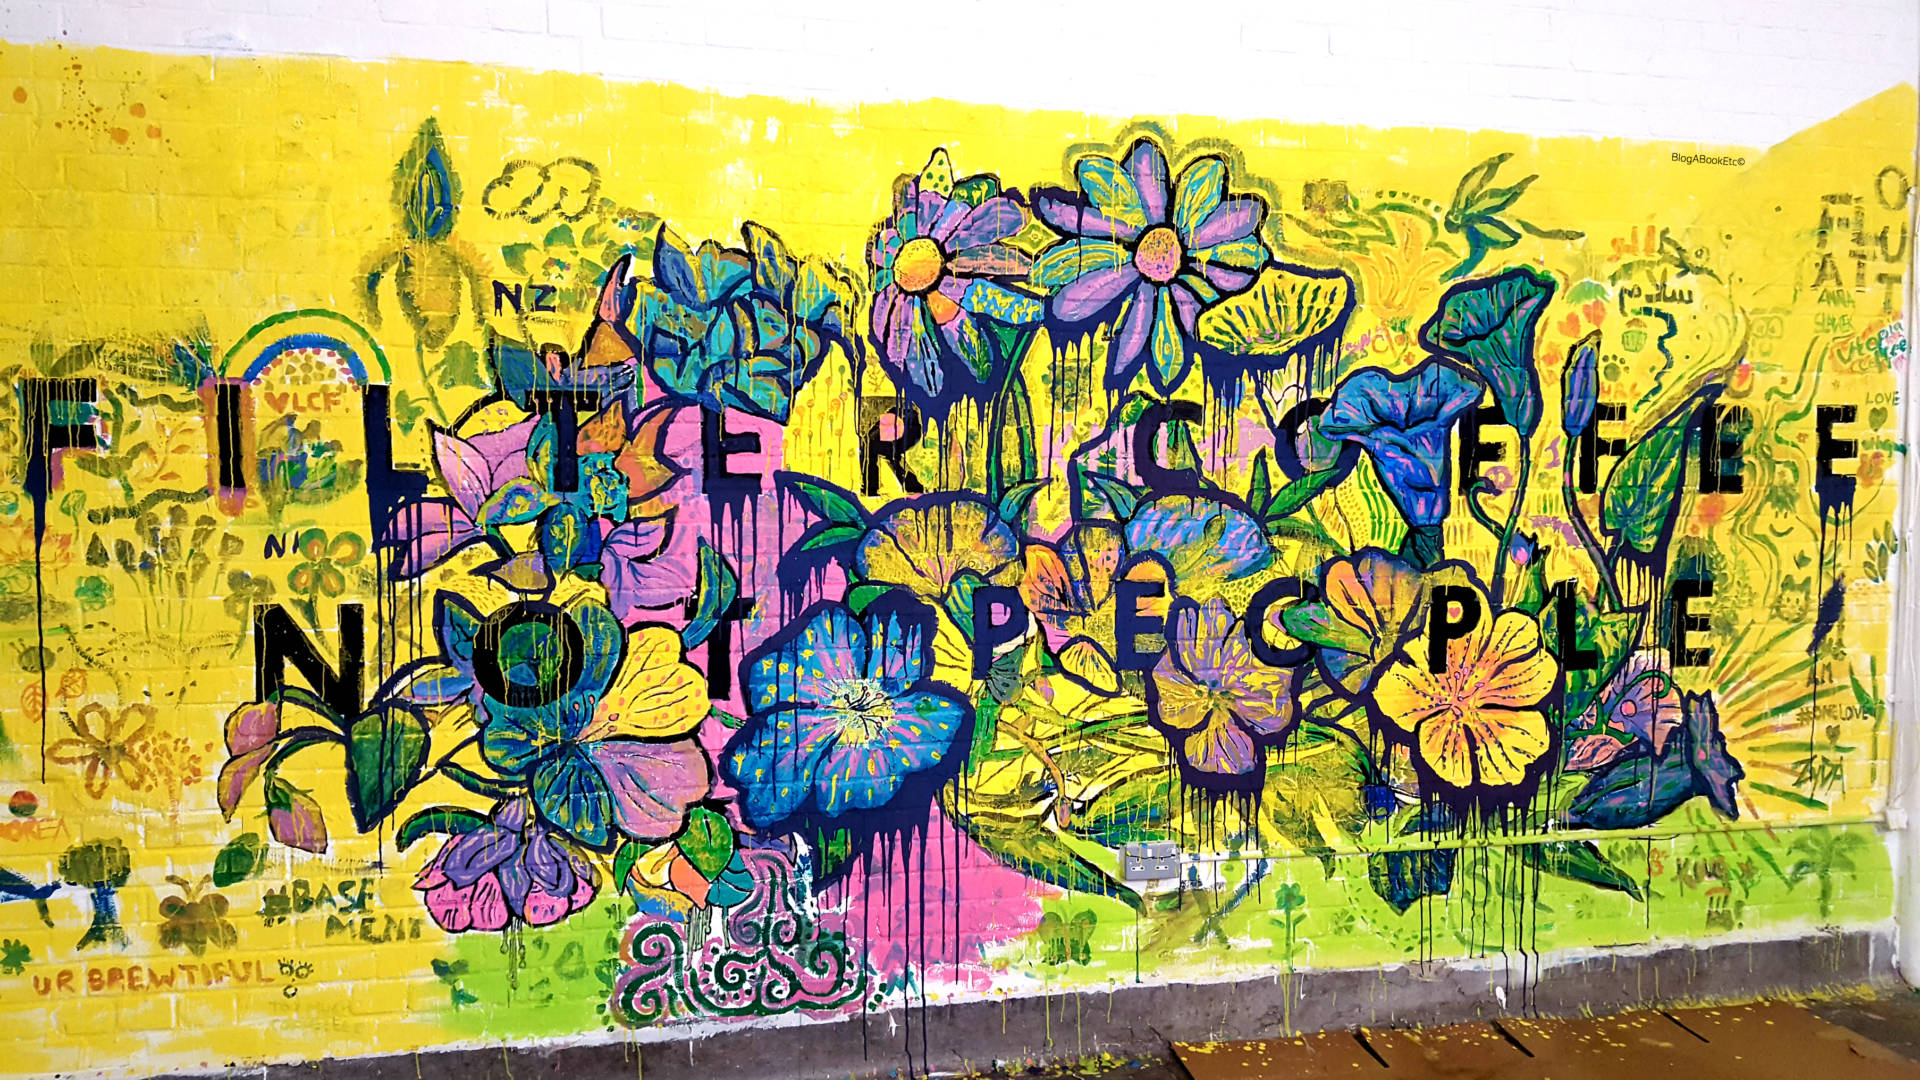 The London Coffee Festival 2017, London Coffee Festival, LCF17, Coffee, Festival, Coffee Festival, London, Wall Art, Street Art, Art, Mural, Filter Coffee, People, Life, Lifestyle, Blogger, London Blogger, Blog A Book Etc, Fay